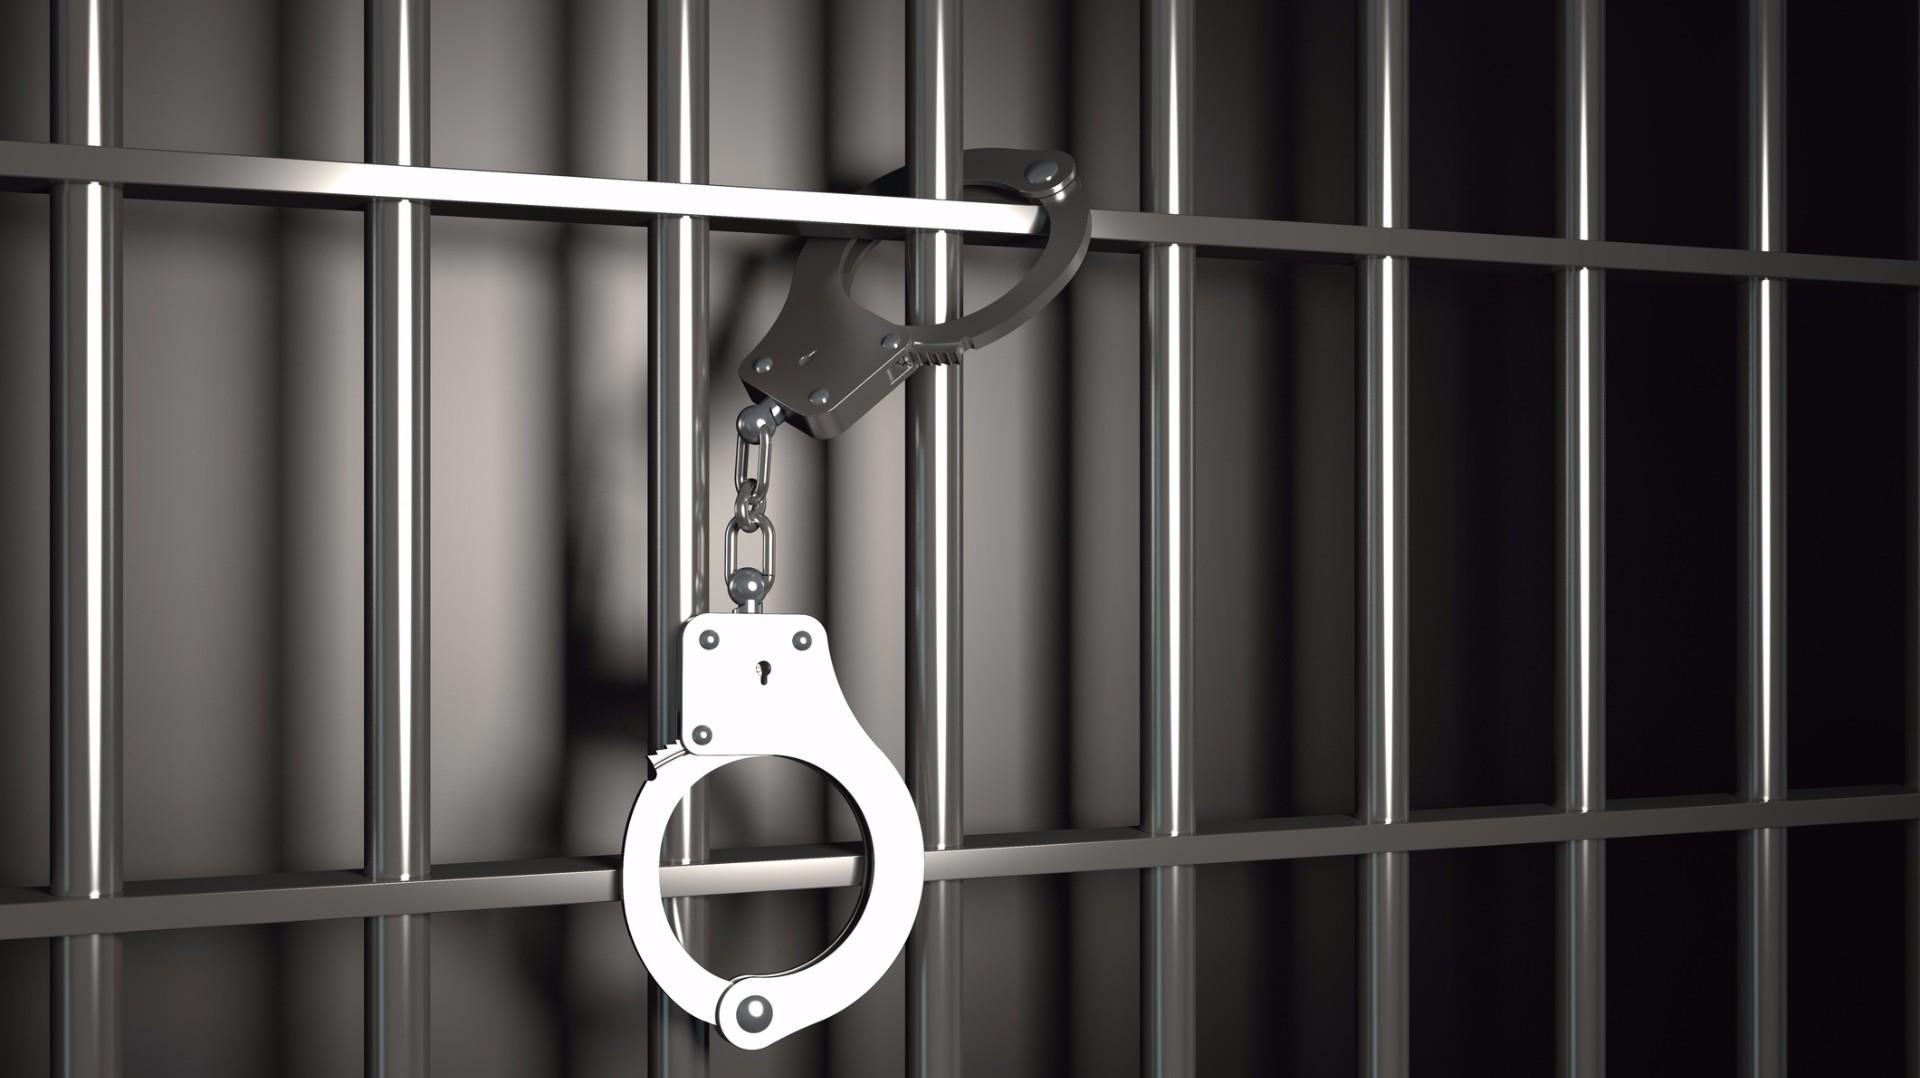 НаУрале экс-сотрудника Ростехнадзора отдали под суд закрупную взятку